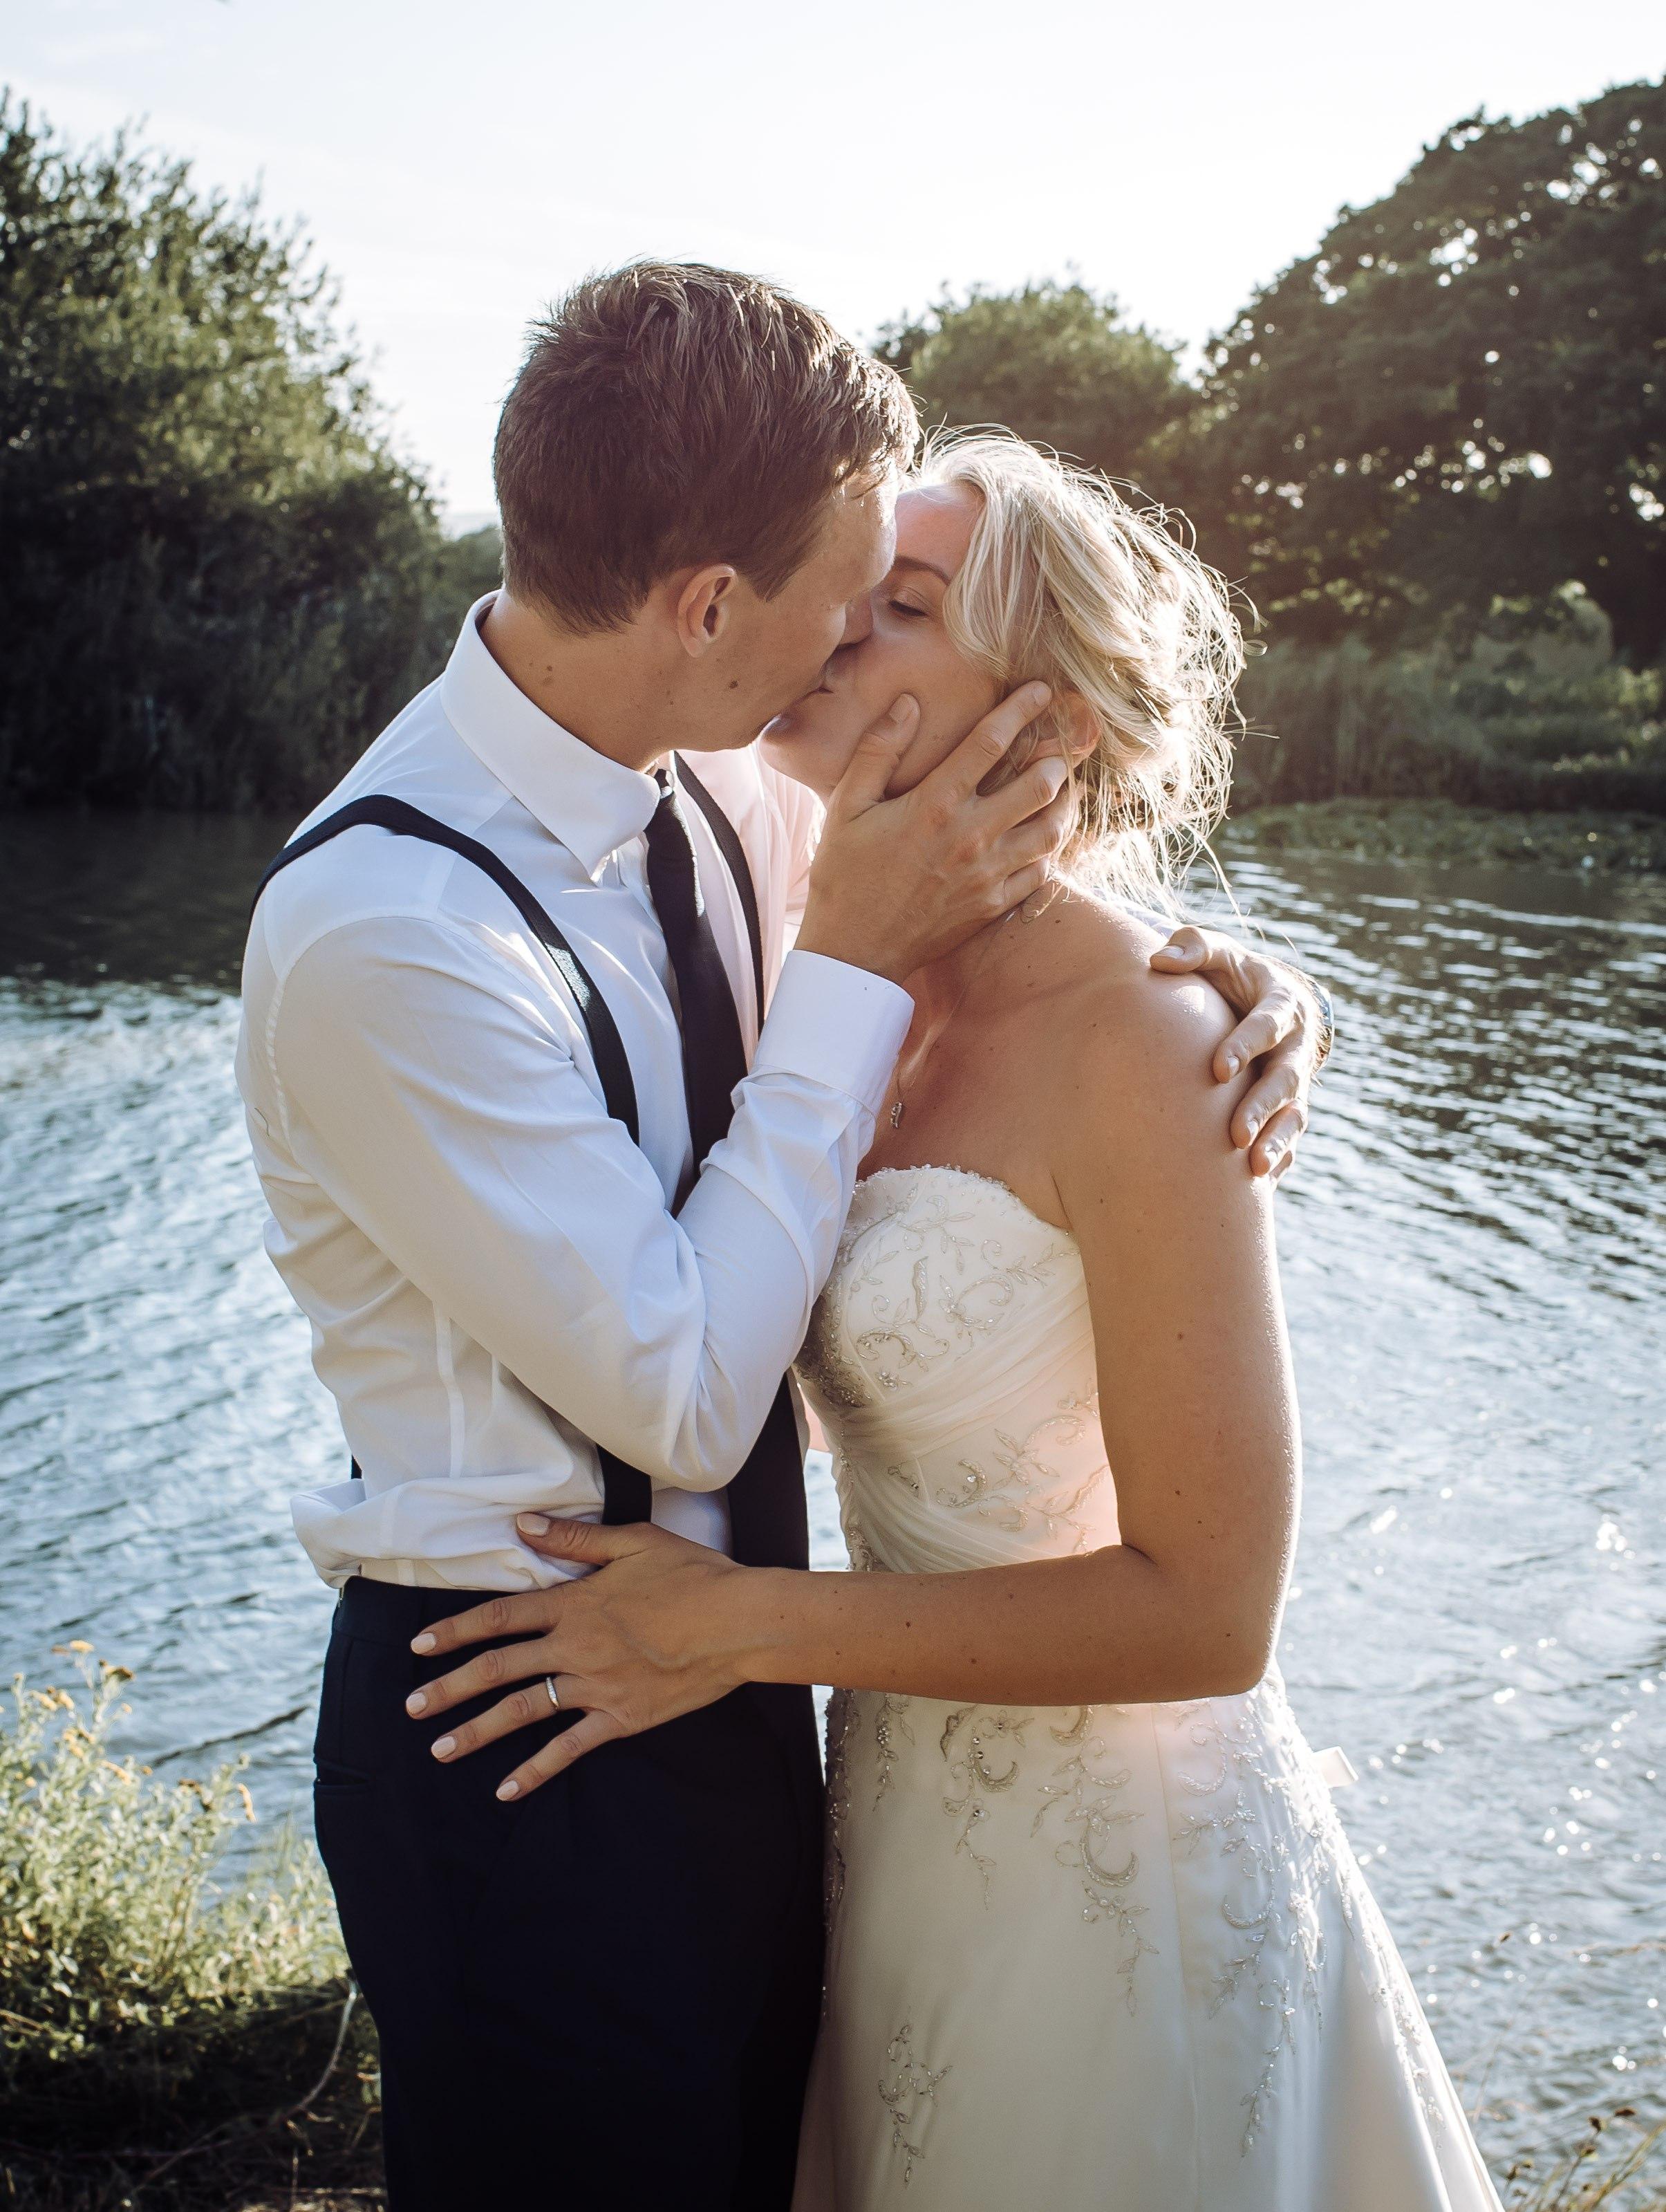 Vintage Wedding - East Sussex Wedding Photographer_0025.jpg